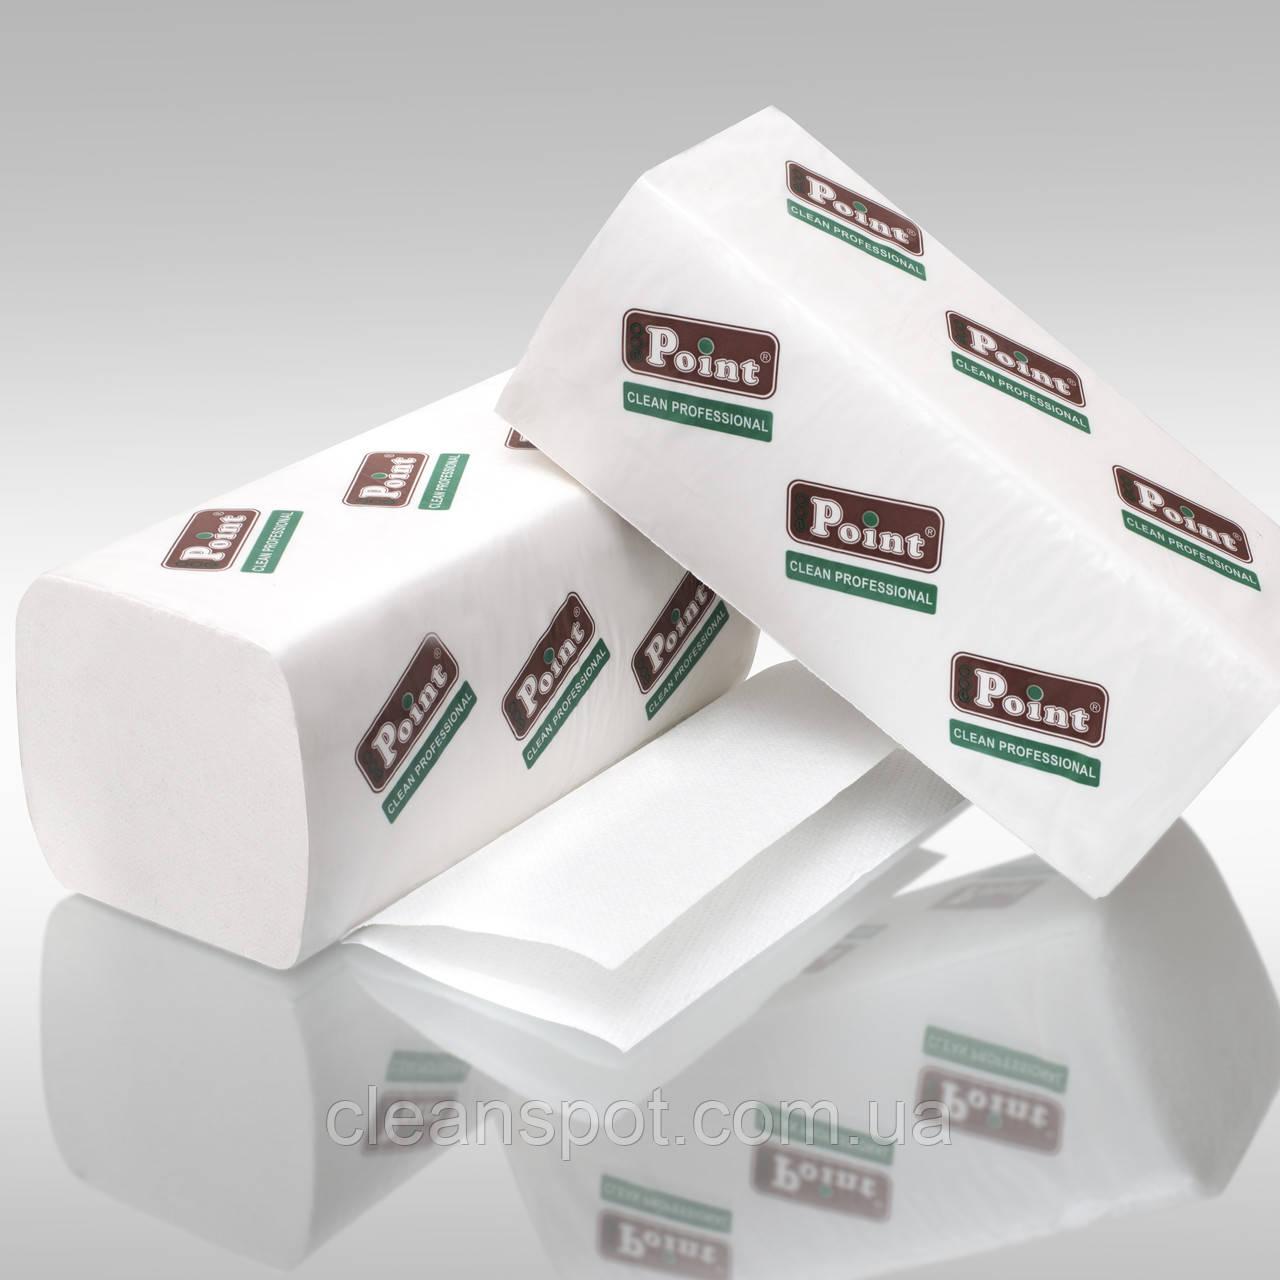 Полотенца бумажные V Lux белые 2-шар 150шт Eco Point